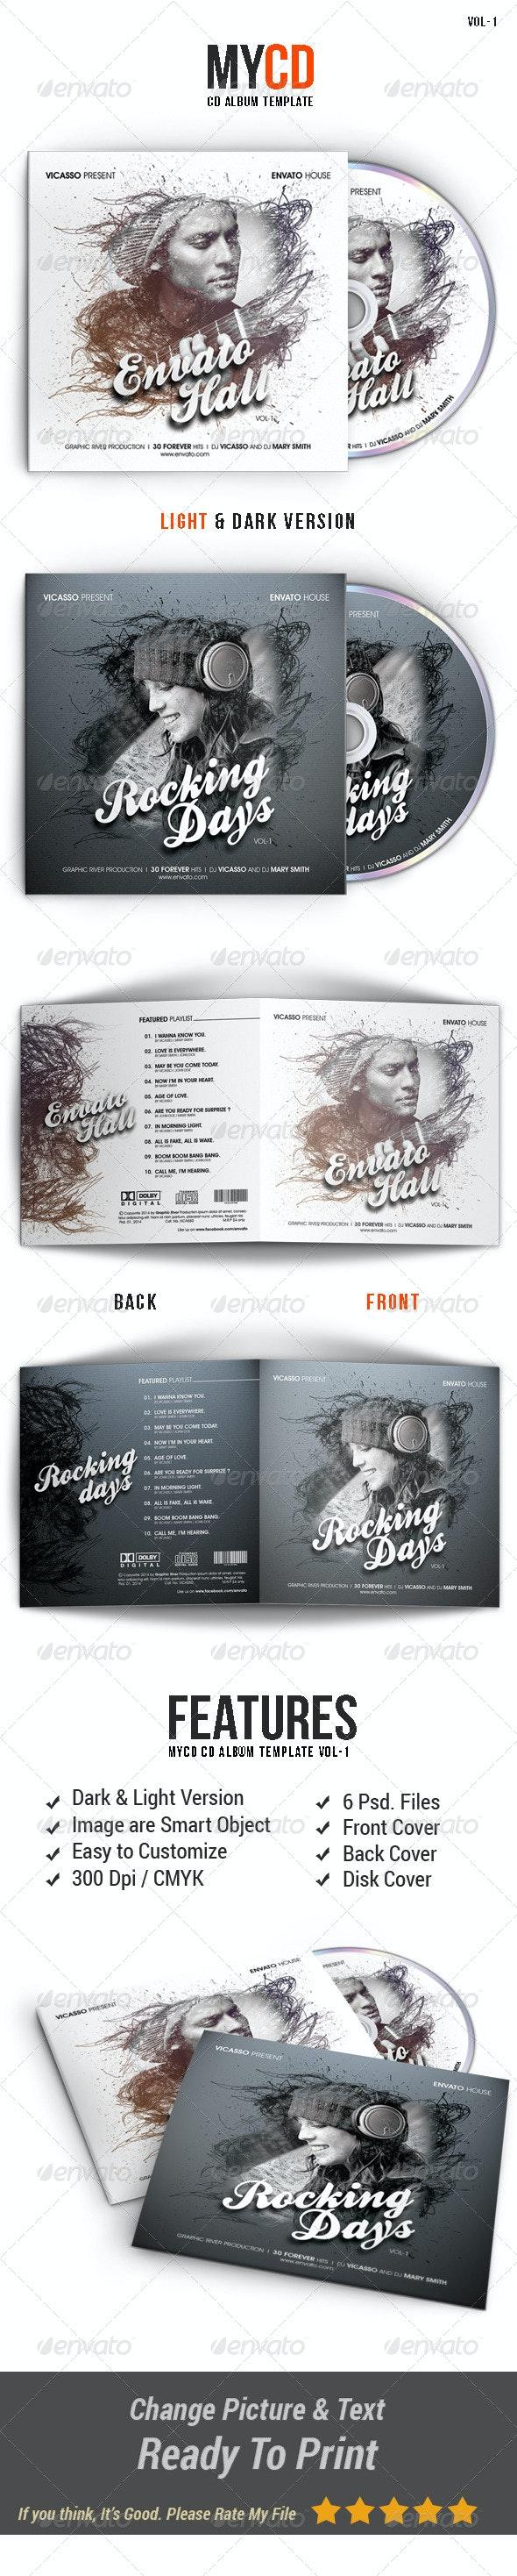 My Cd Template Vol.1 - CD & DVD Artwork Print Templates